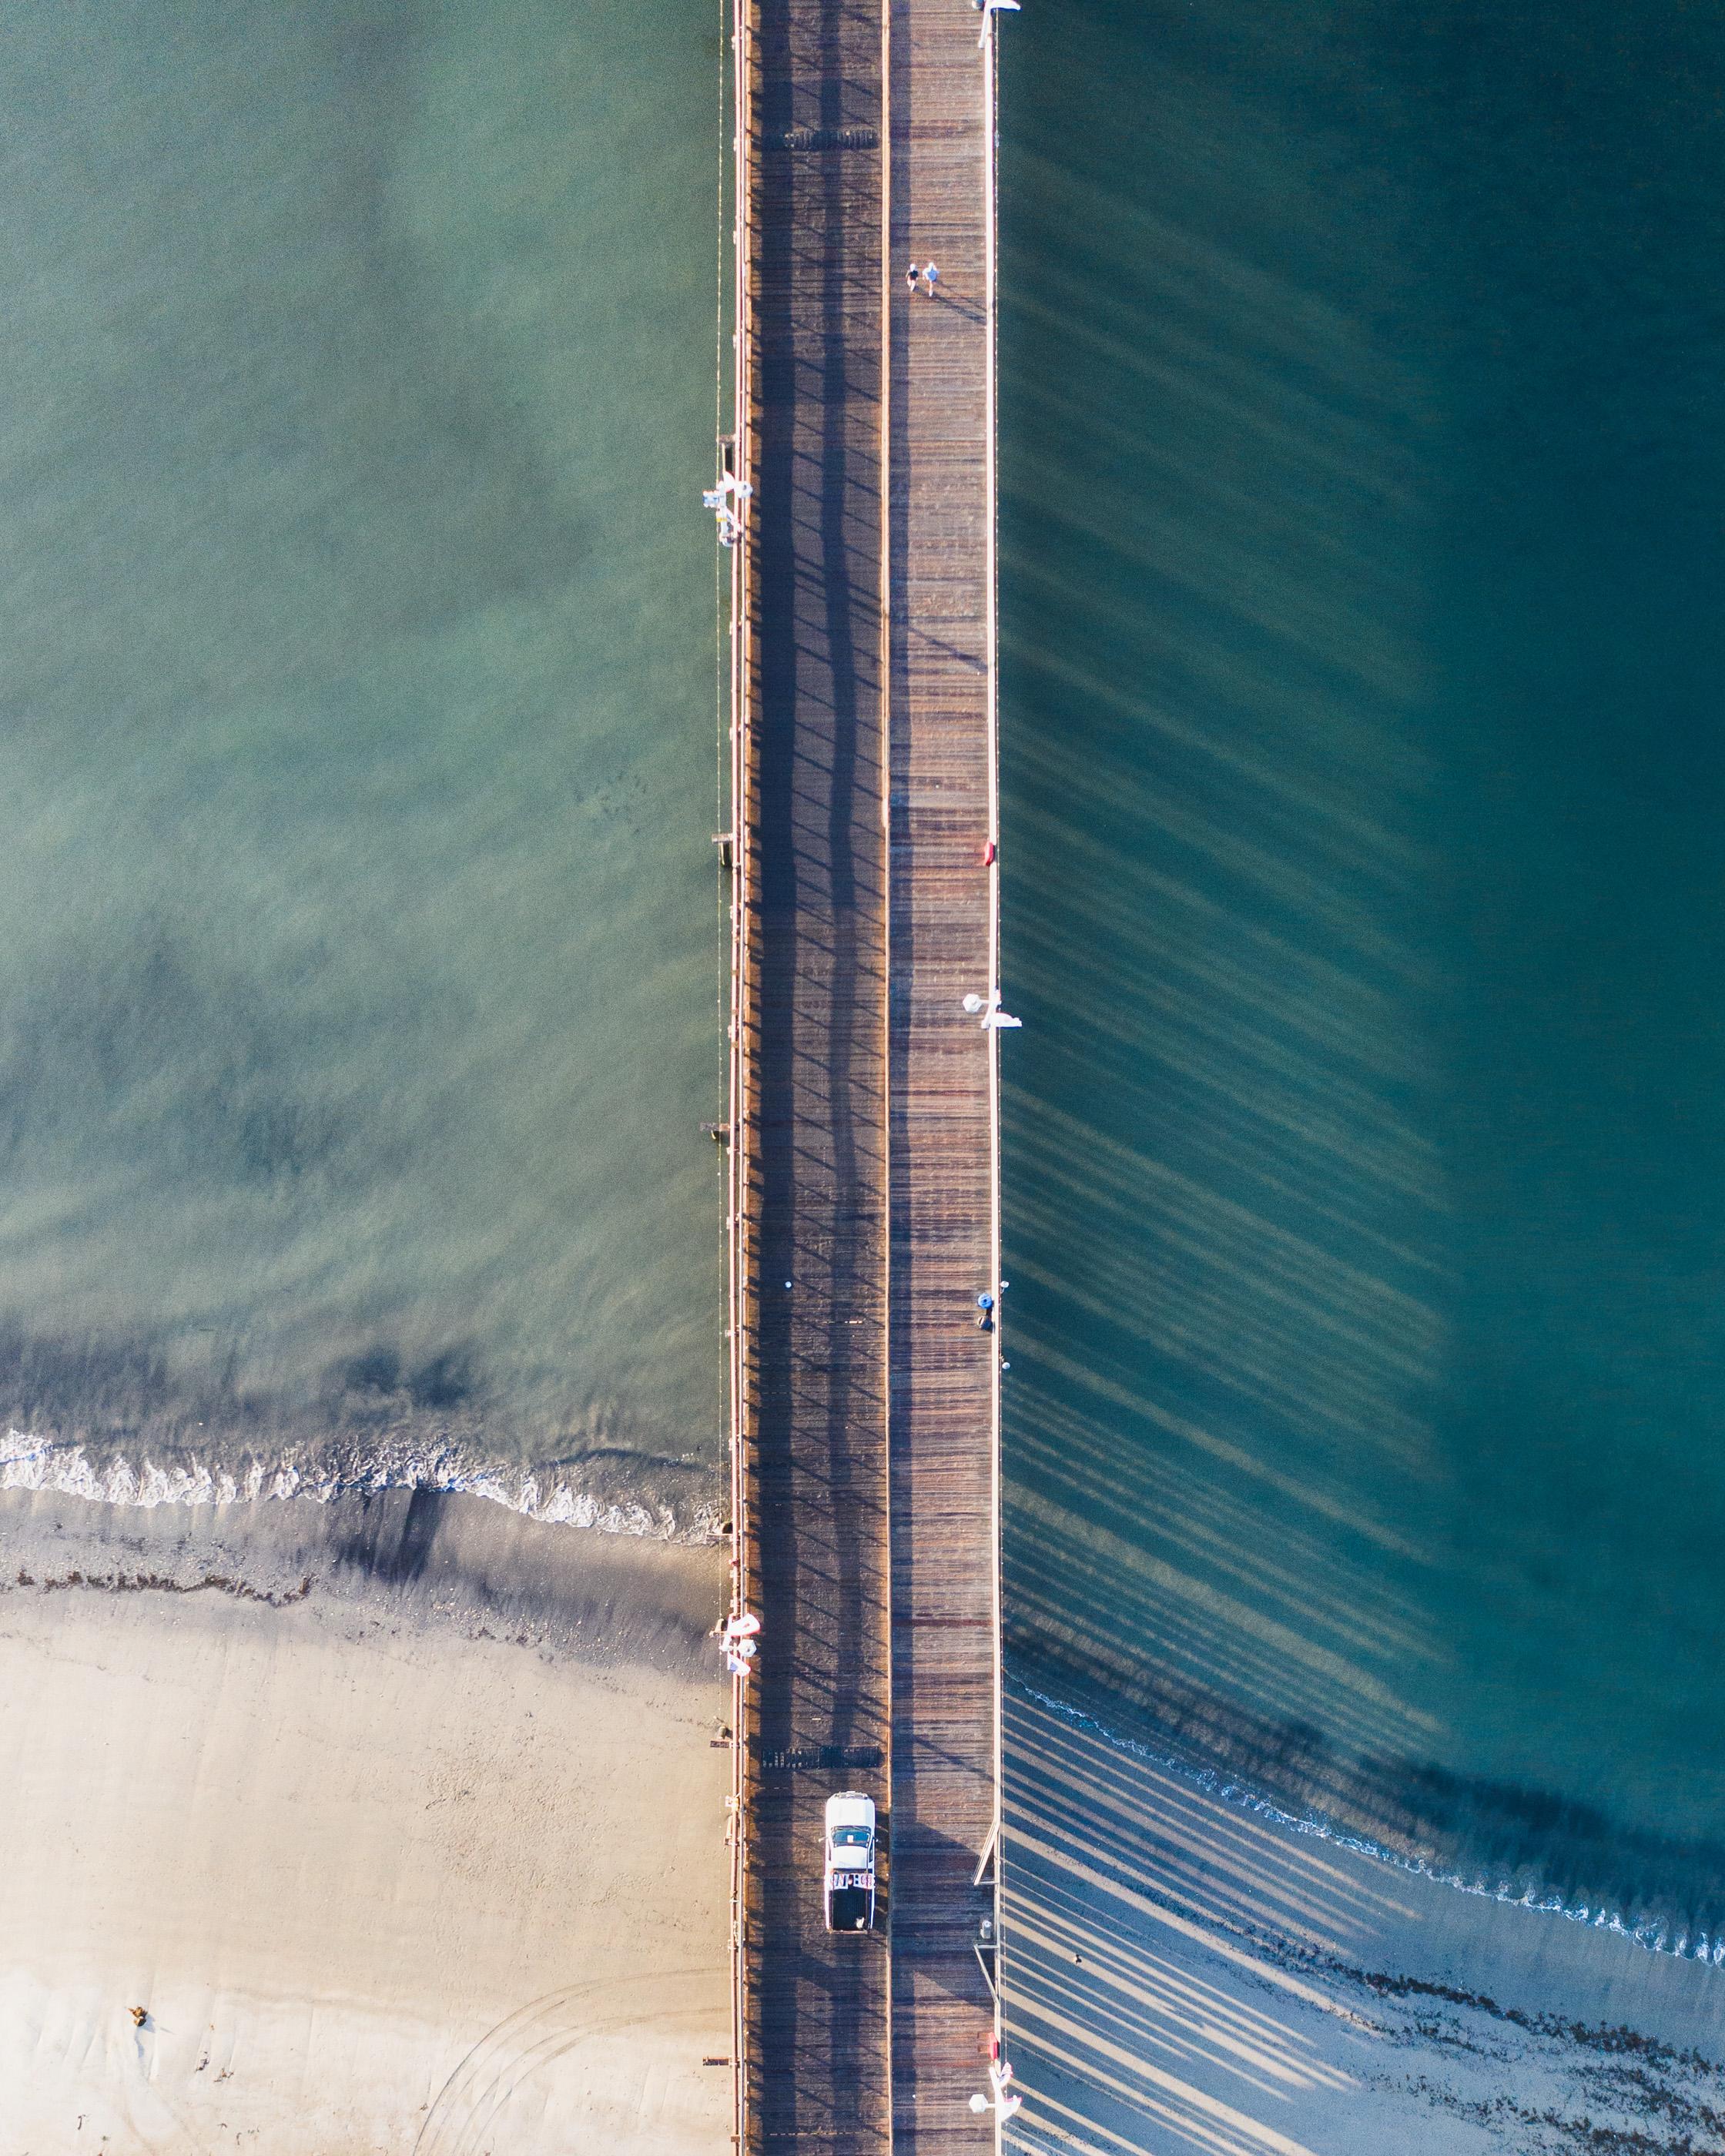 Los-Angeles-Aerial-Drone-Photographer-0687.jpg